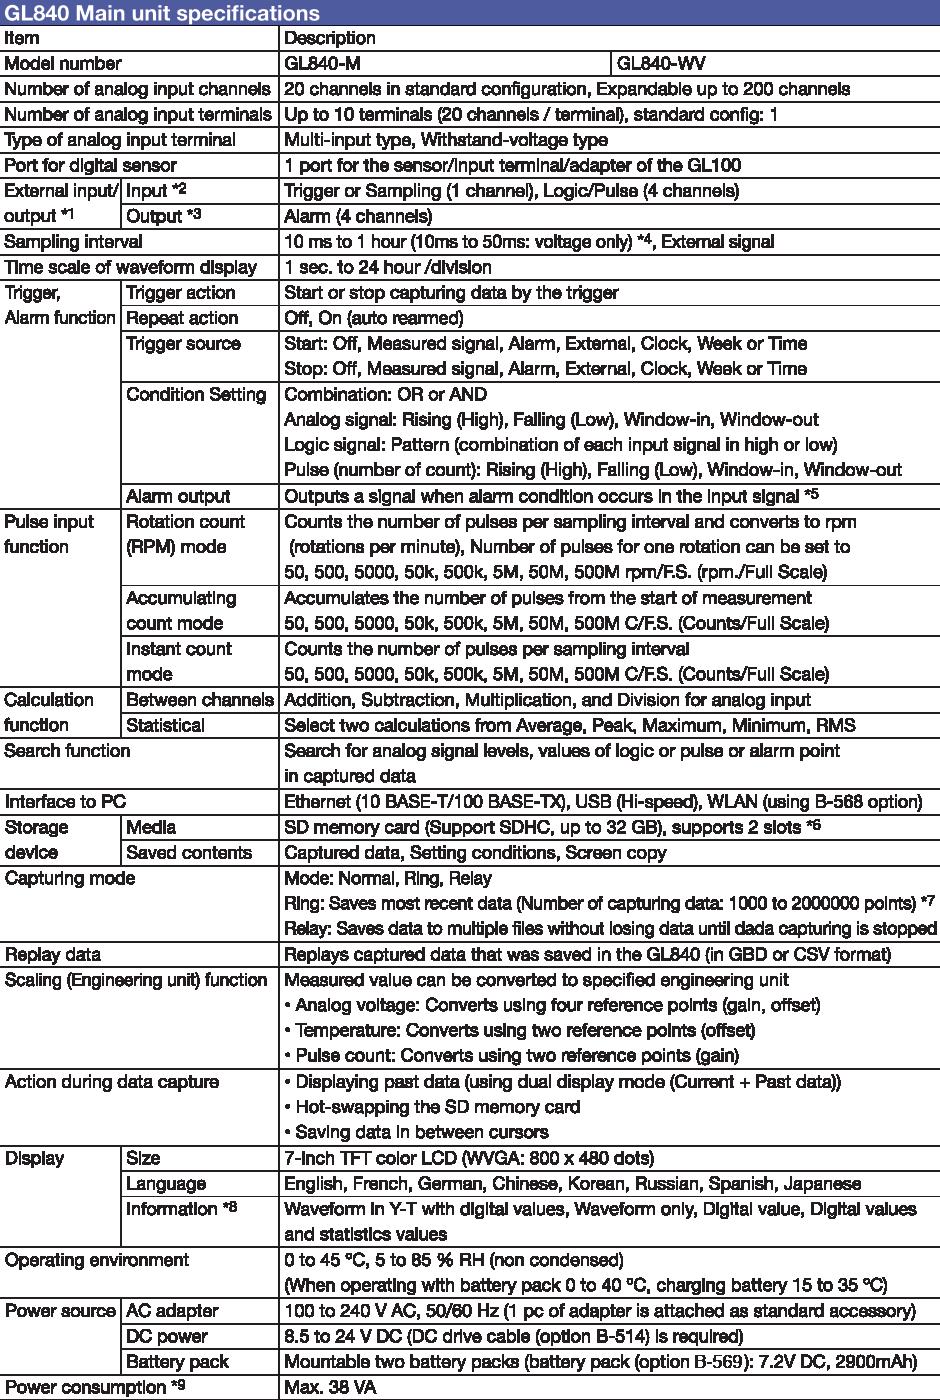 gl840 screen based datalogger specifications